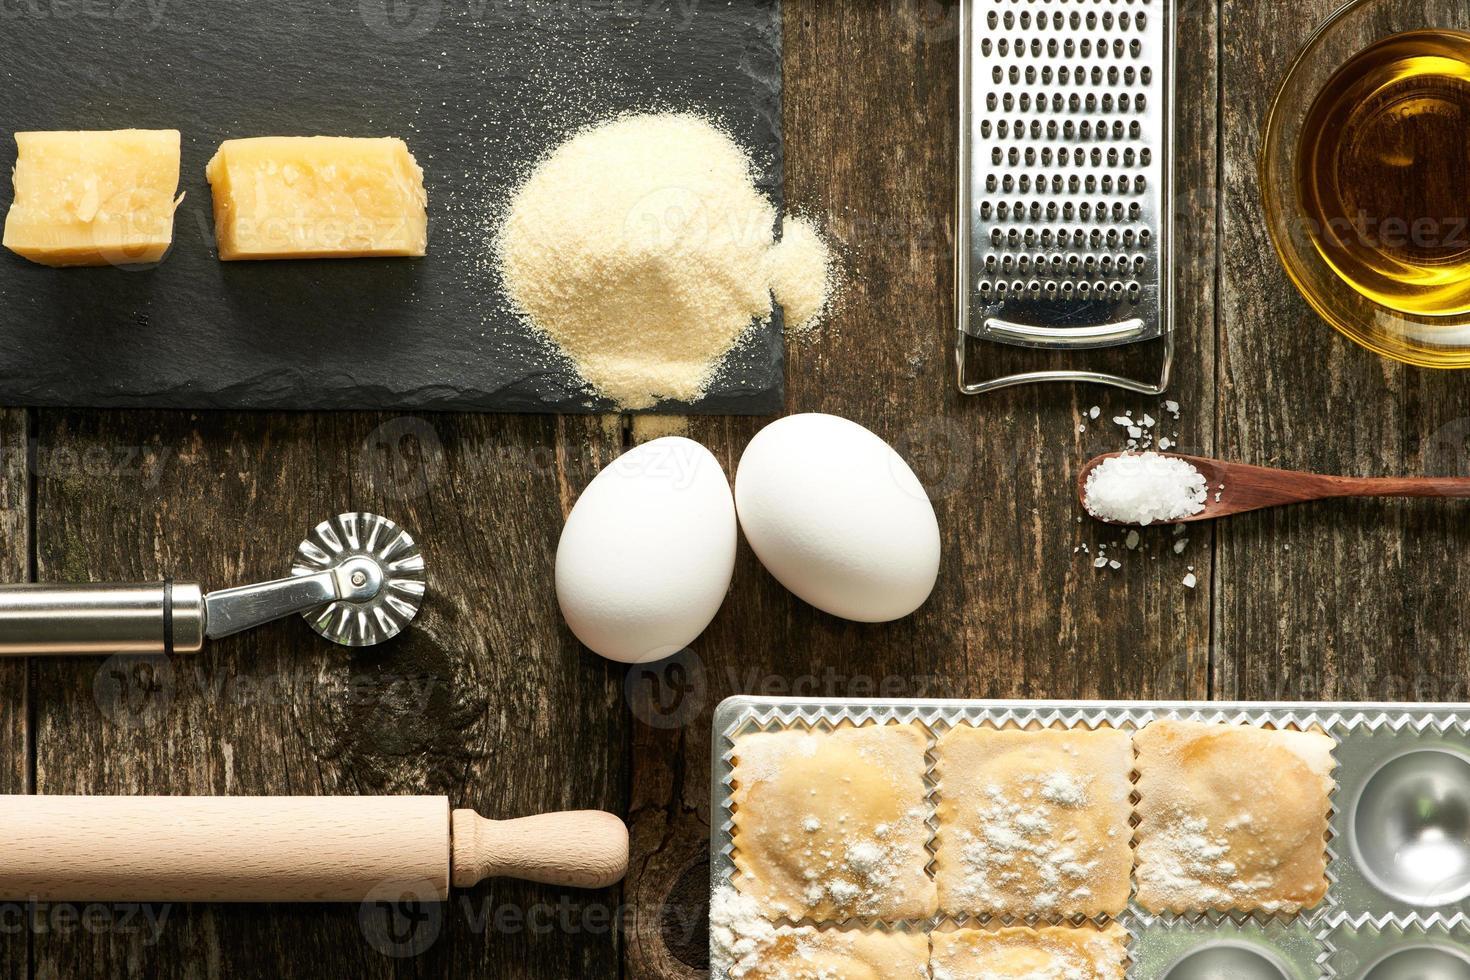 utensili e ingredienti per ravioli foto